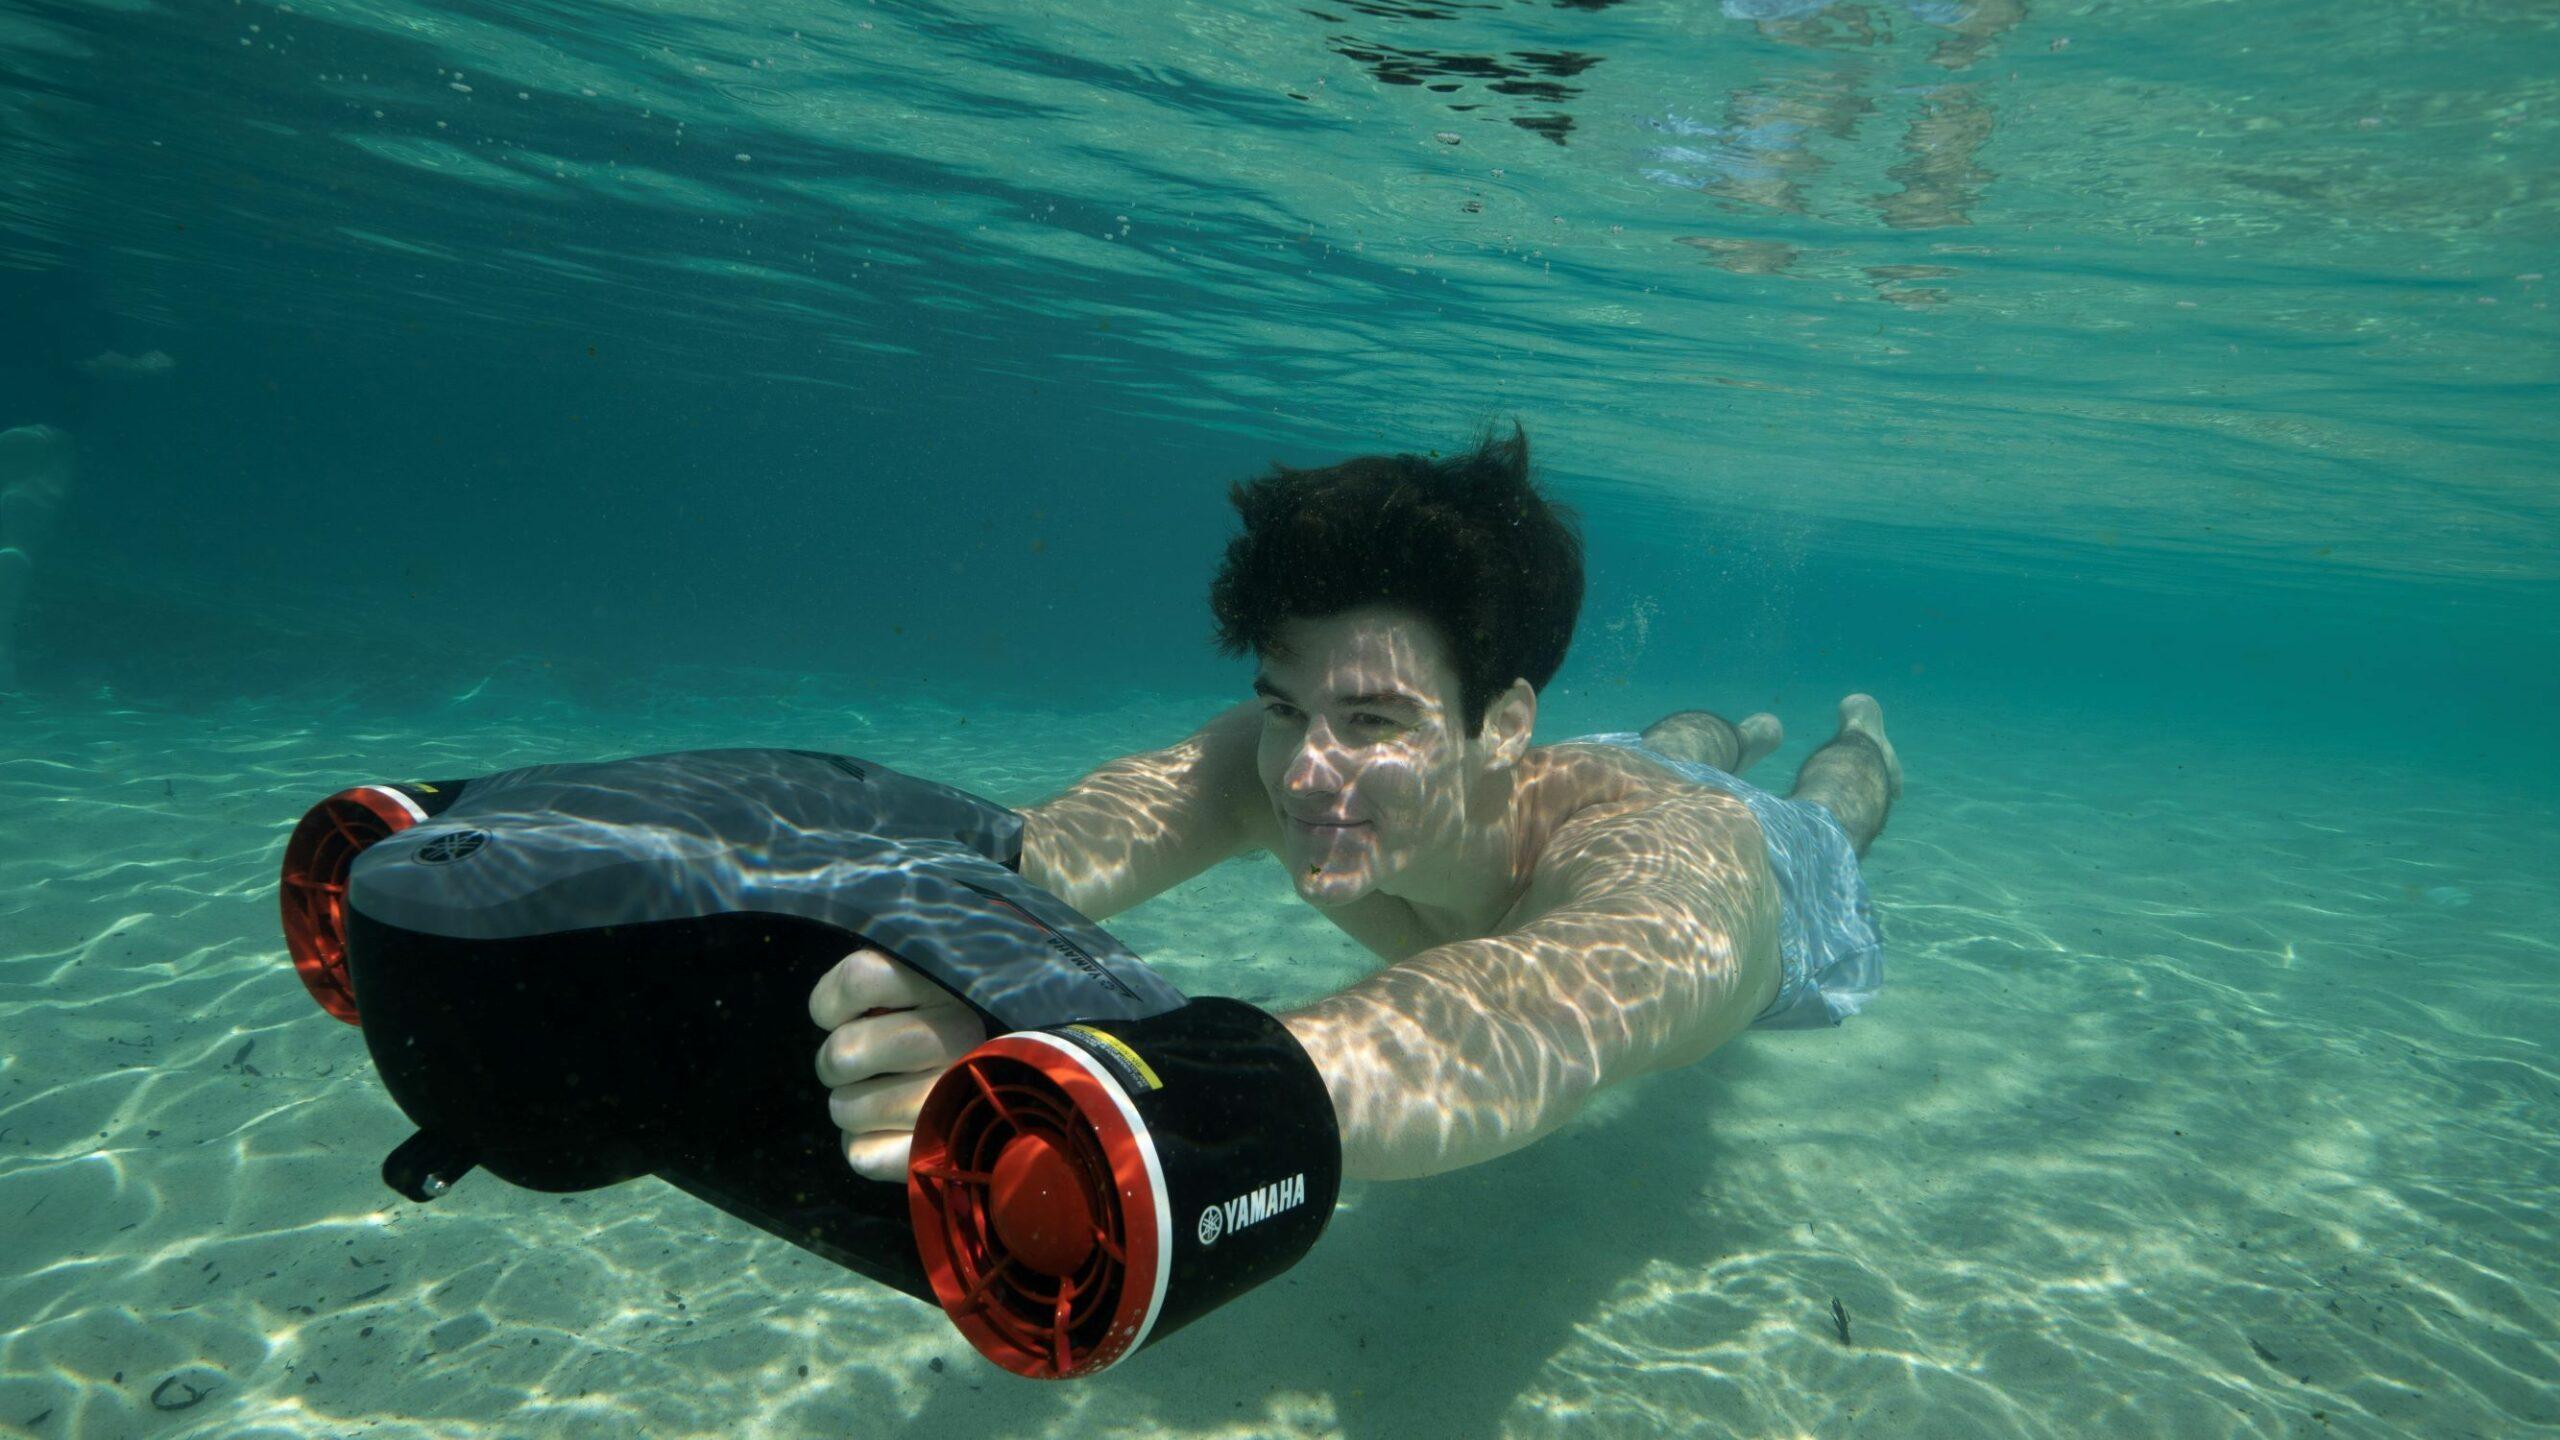 seawing 2 in action underwater